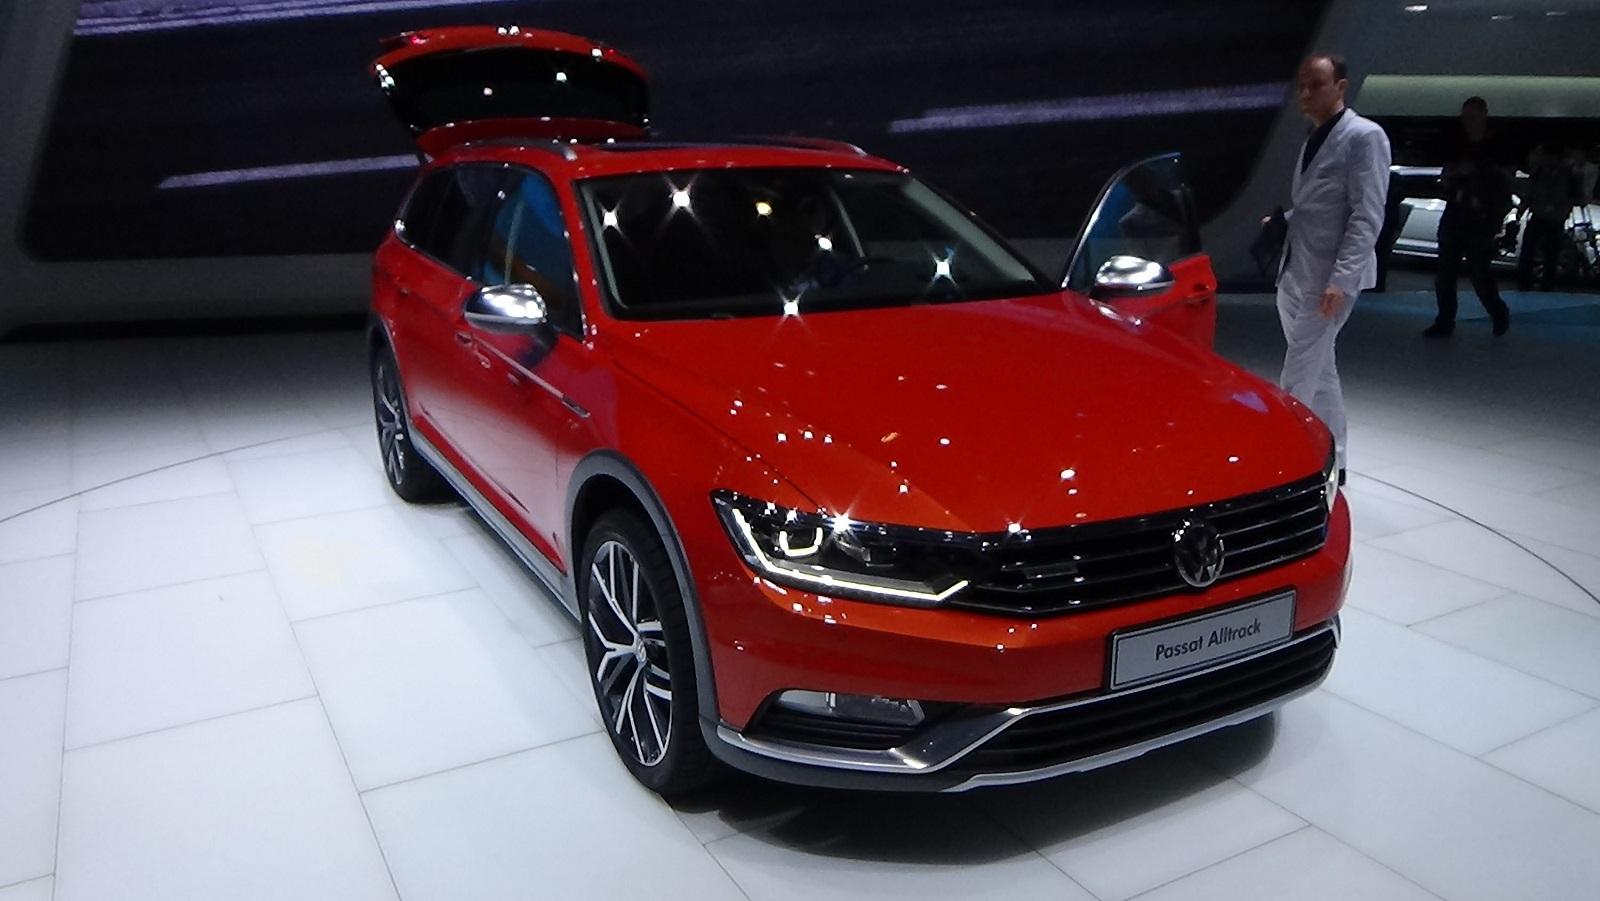 2016 Volkswagen Passat Alltrack Exterior Preview Auto Show (Photo 8 of 18)